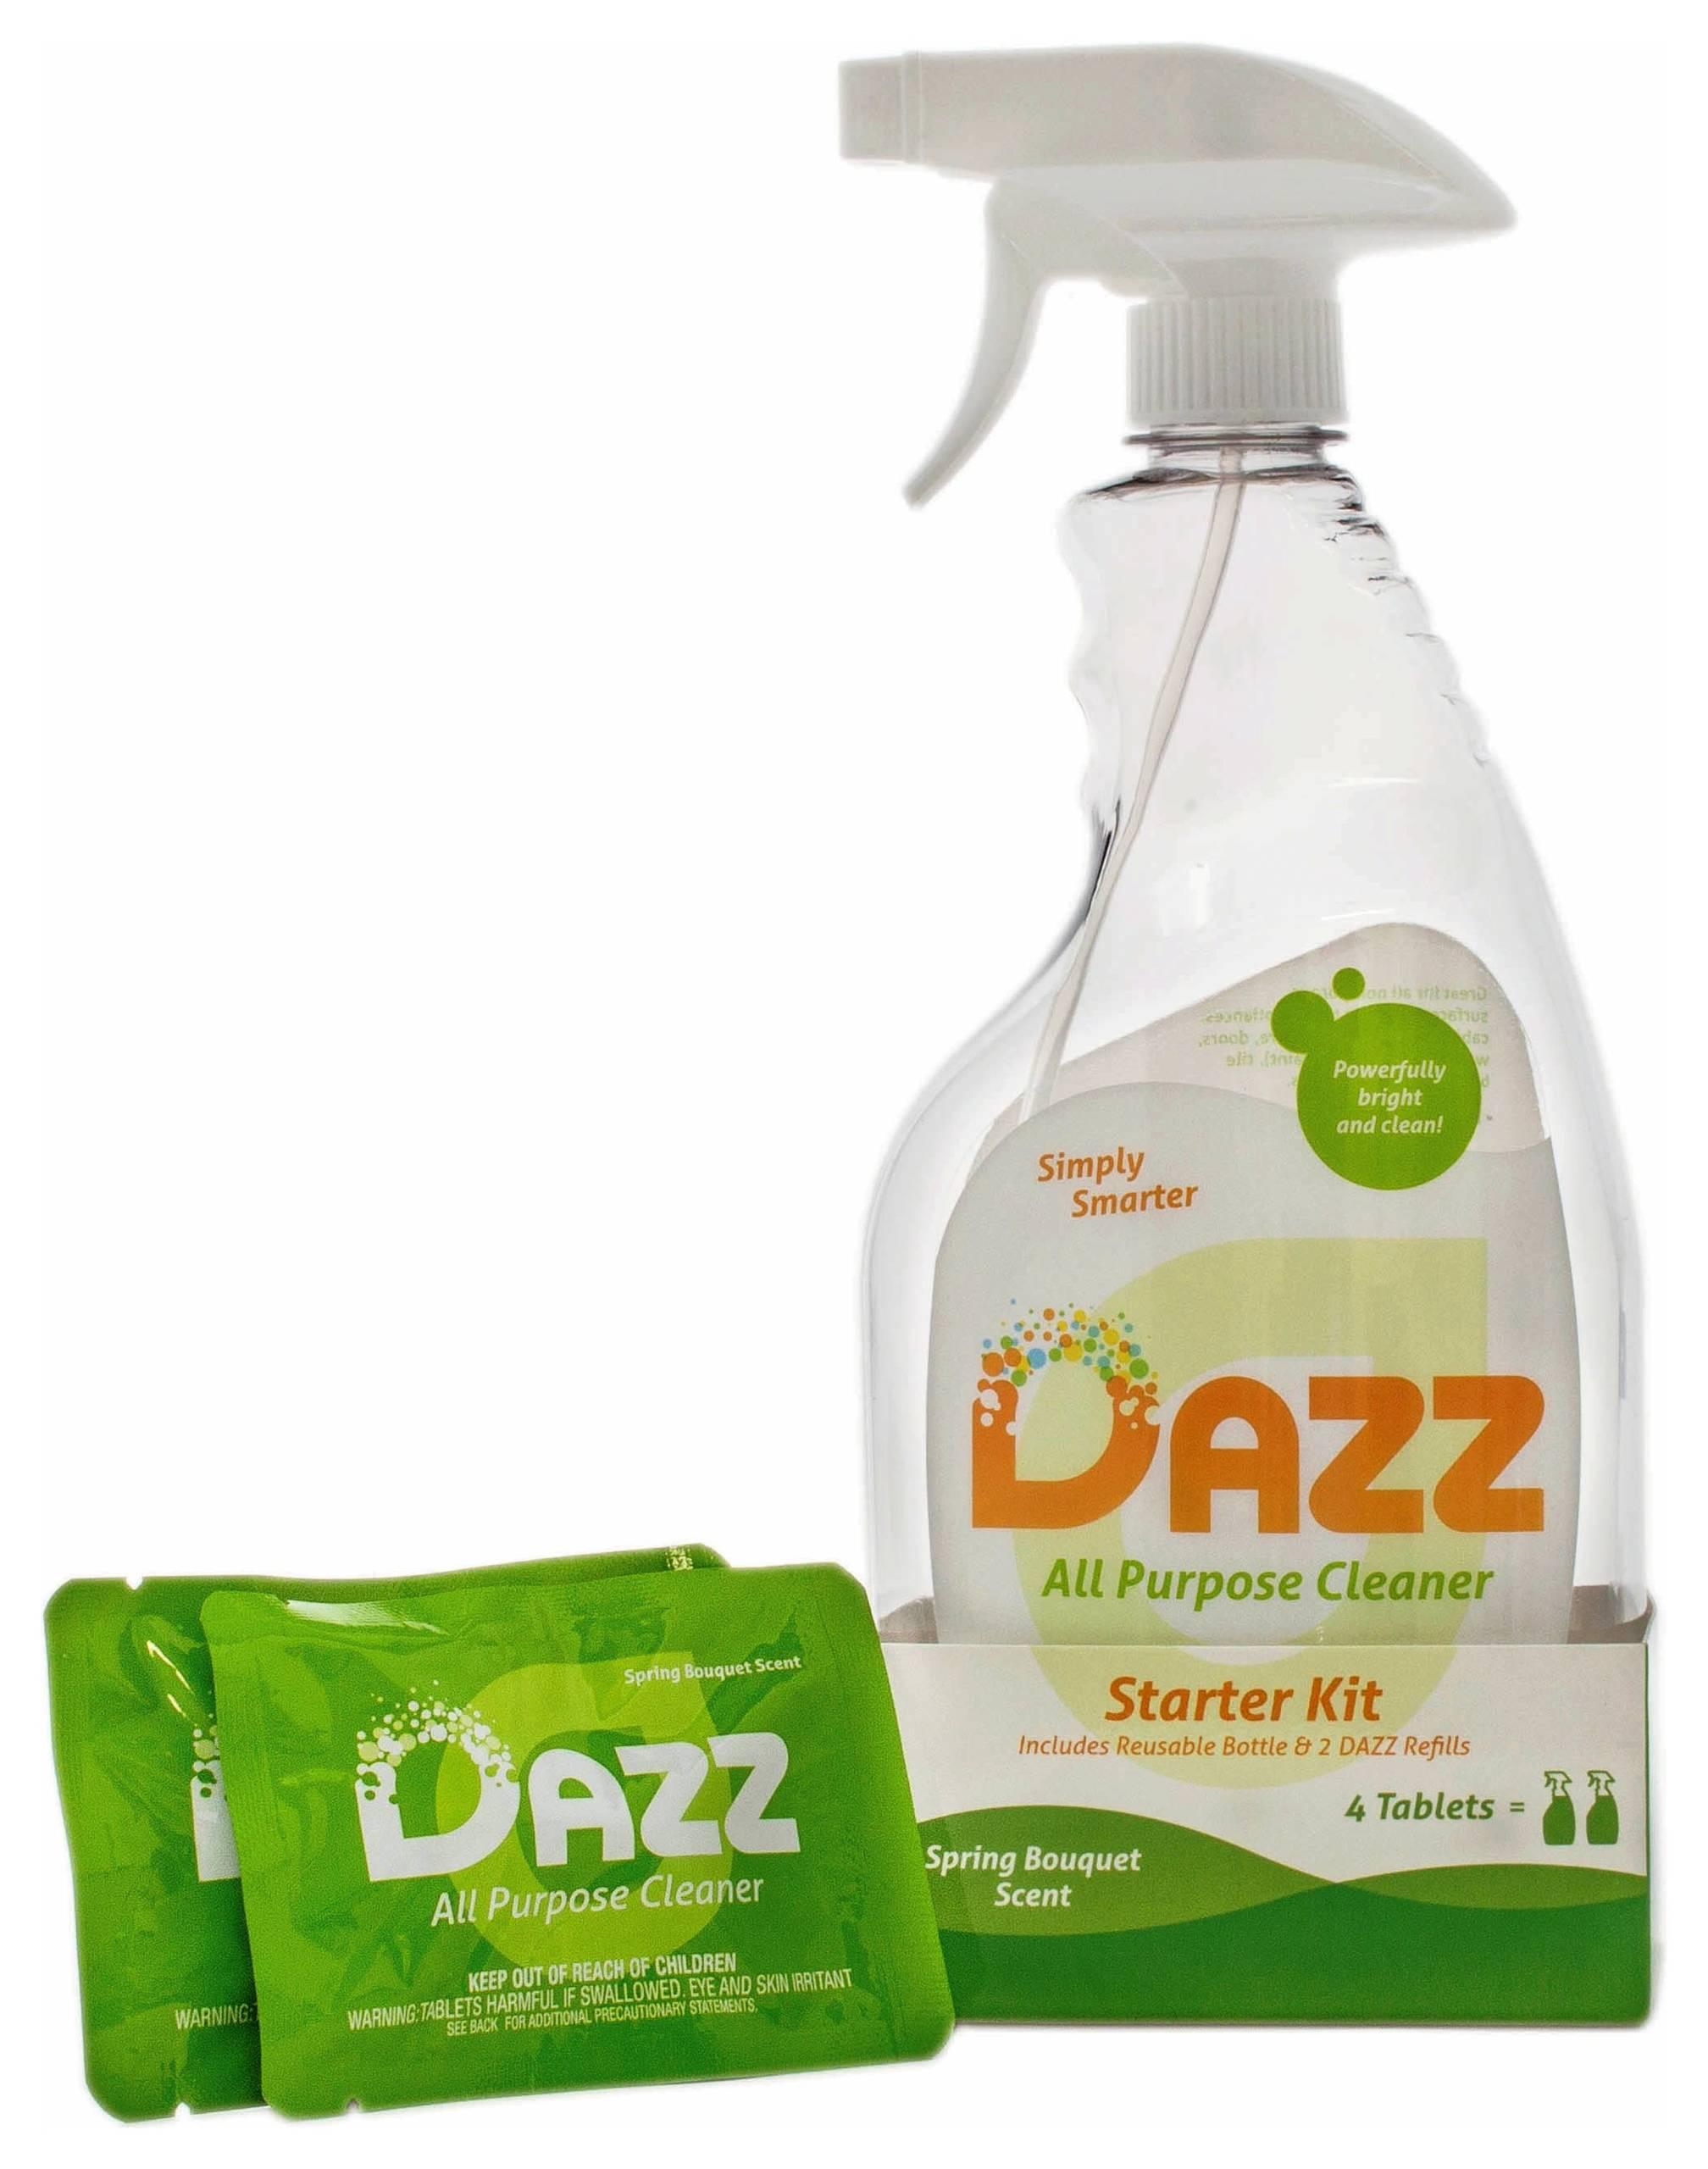 DAZZ All-Purpose Cleaner